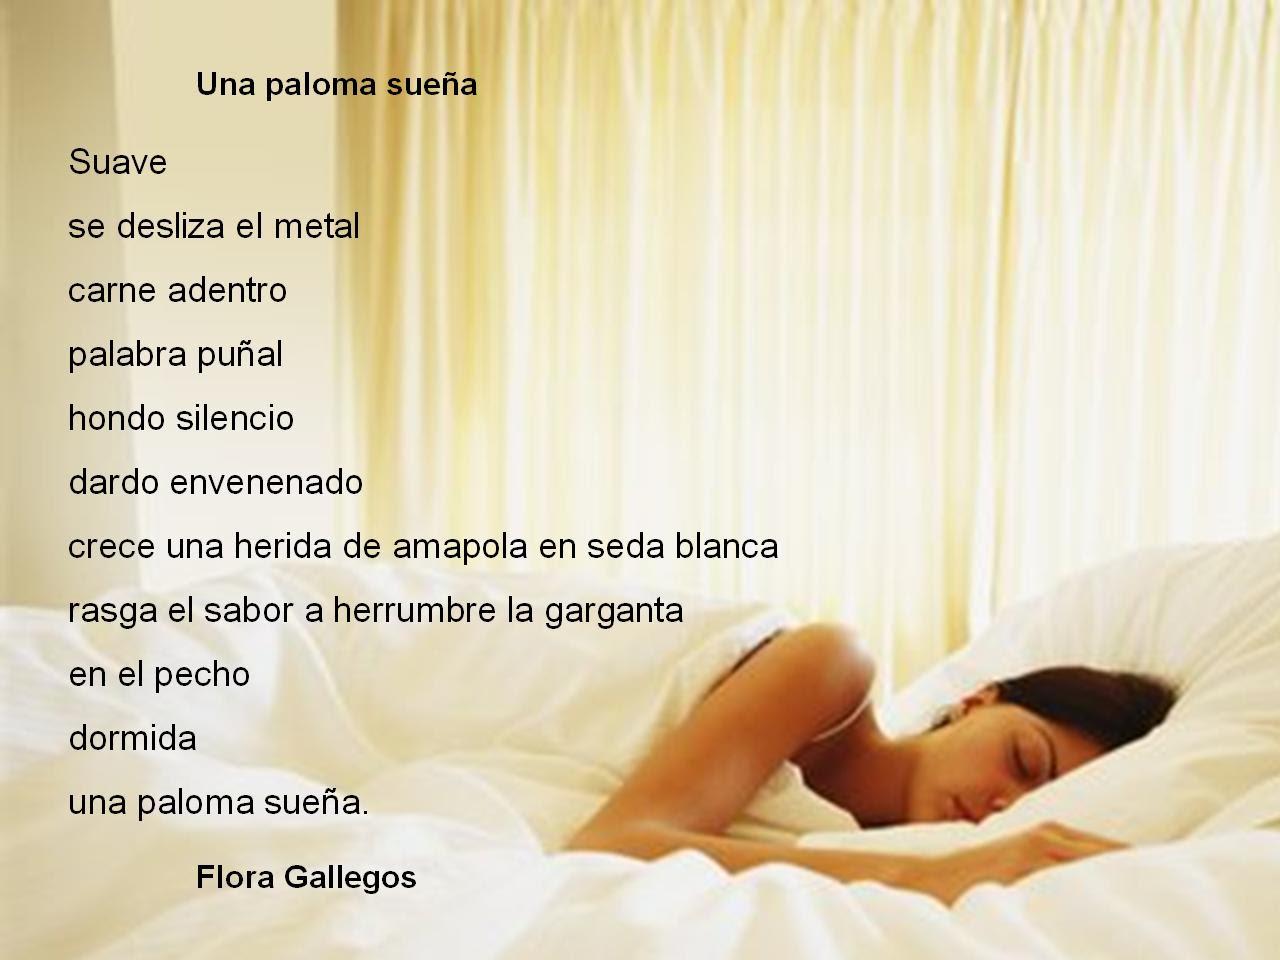 Frases De Amor En Gallego Y Espaãol Hallowem